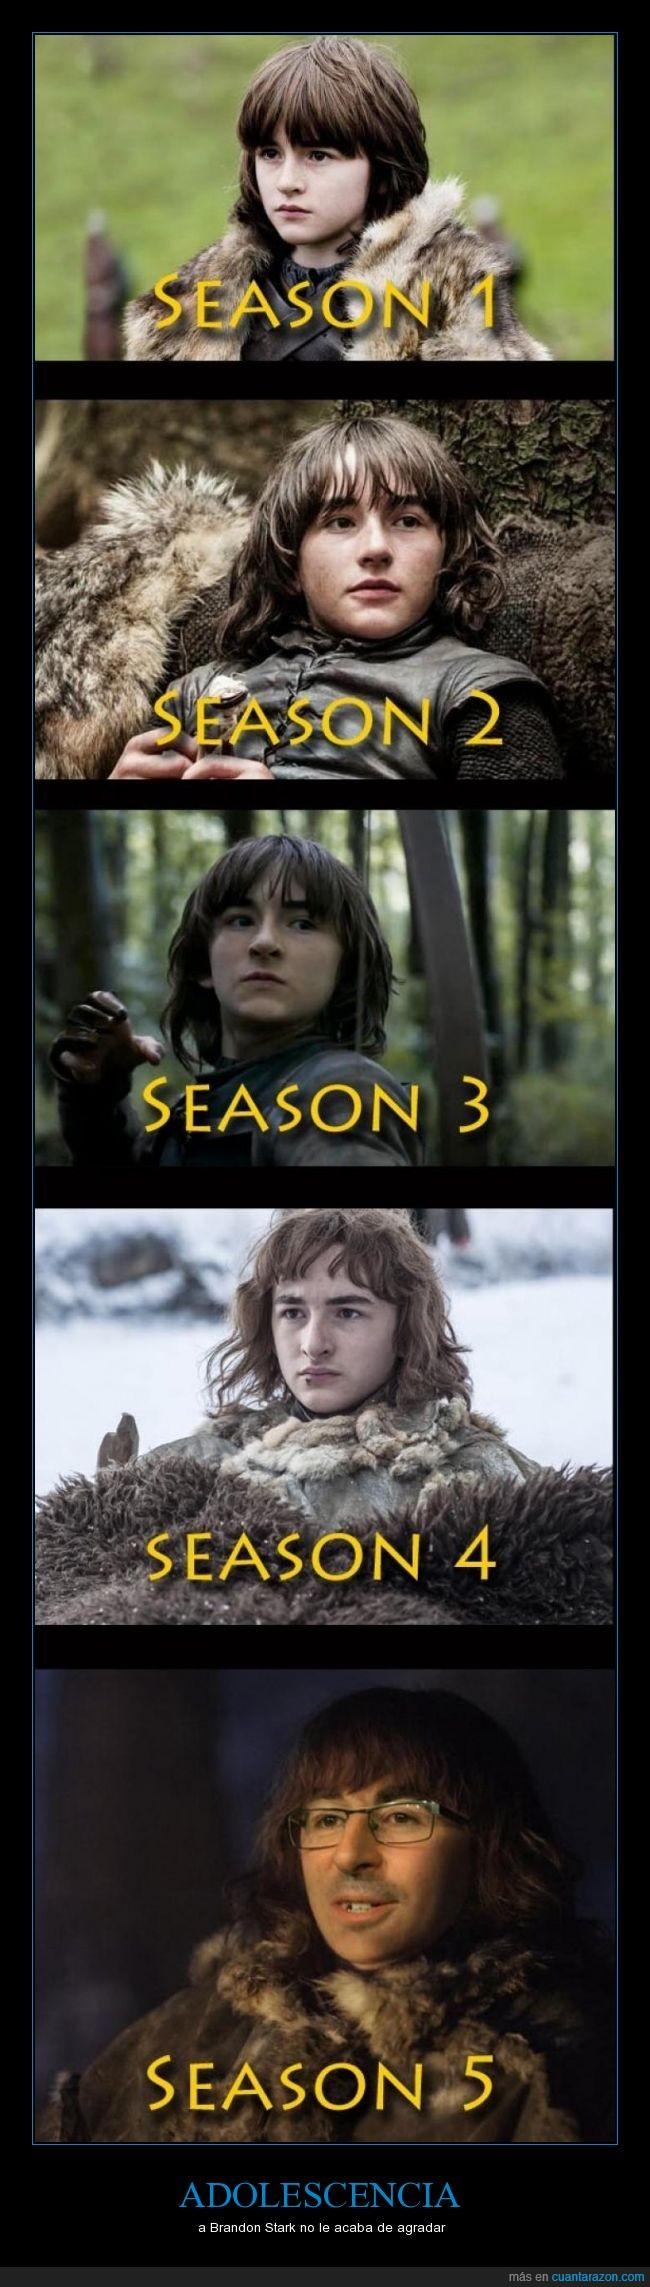 actor,adolescencia,bran,crecer,got,ingles,jdt,pobre muchacho,pubertad,stark